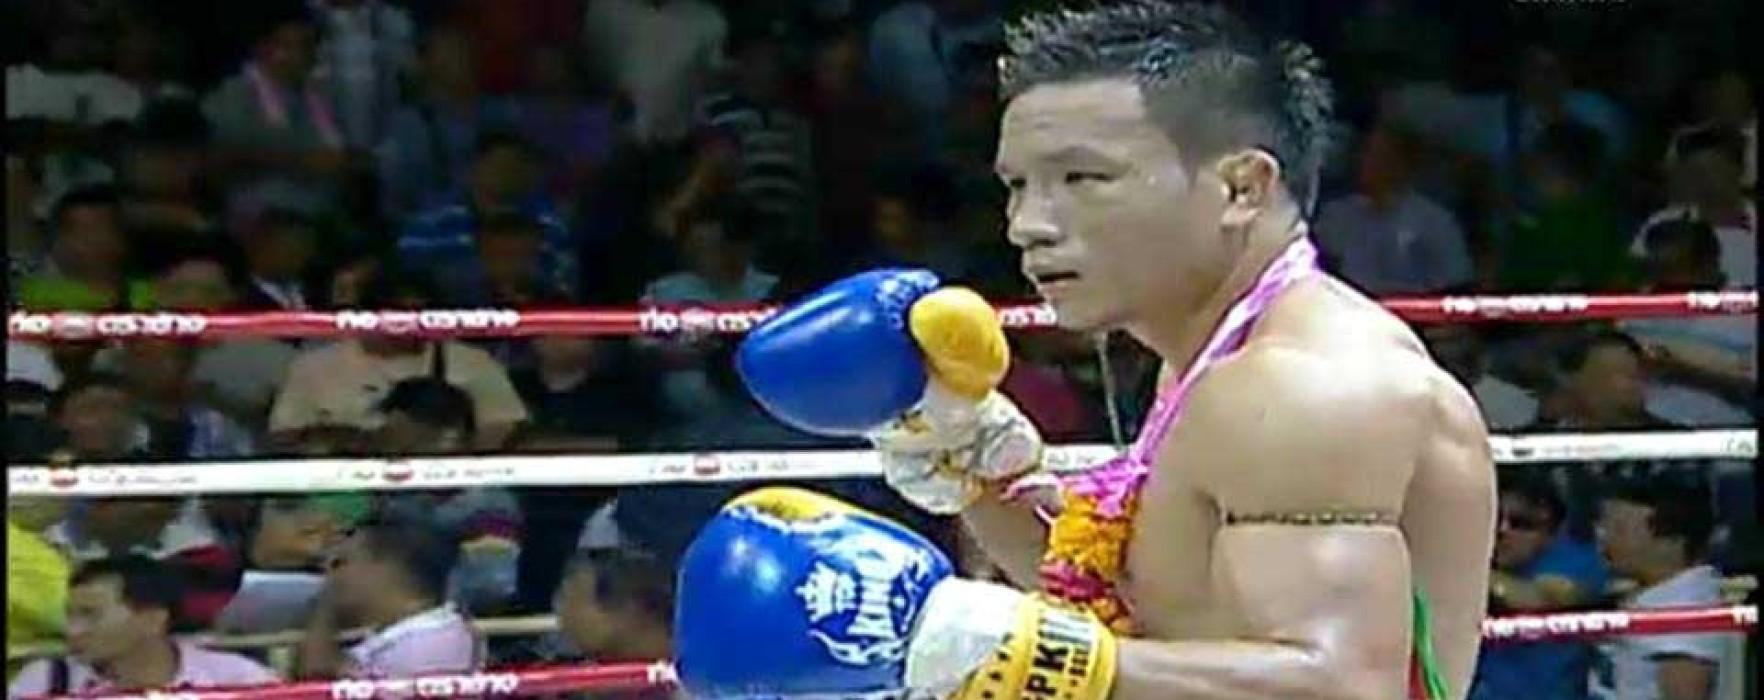 Video: Changpuak Jetsada Pongtong vs Kongnakhonban Sor Kitrungroth – Isuzu Cup – Secondo Match – 30 Agosto 2014